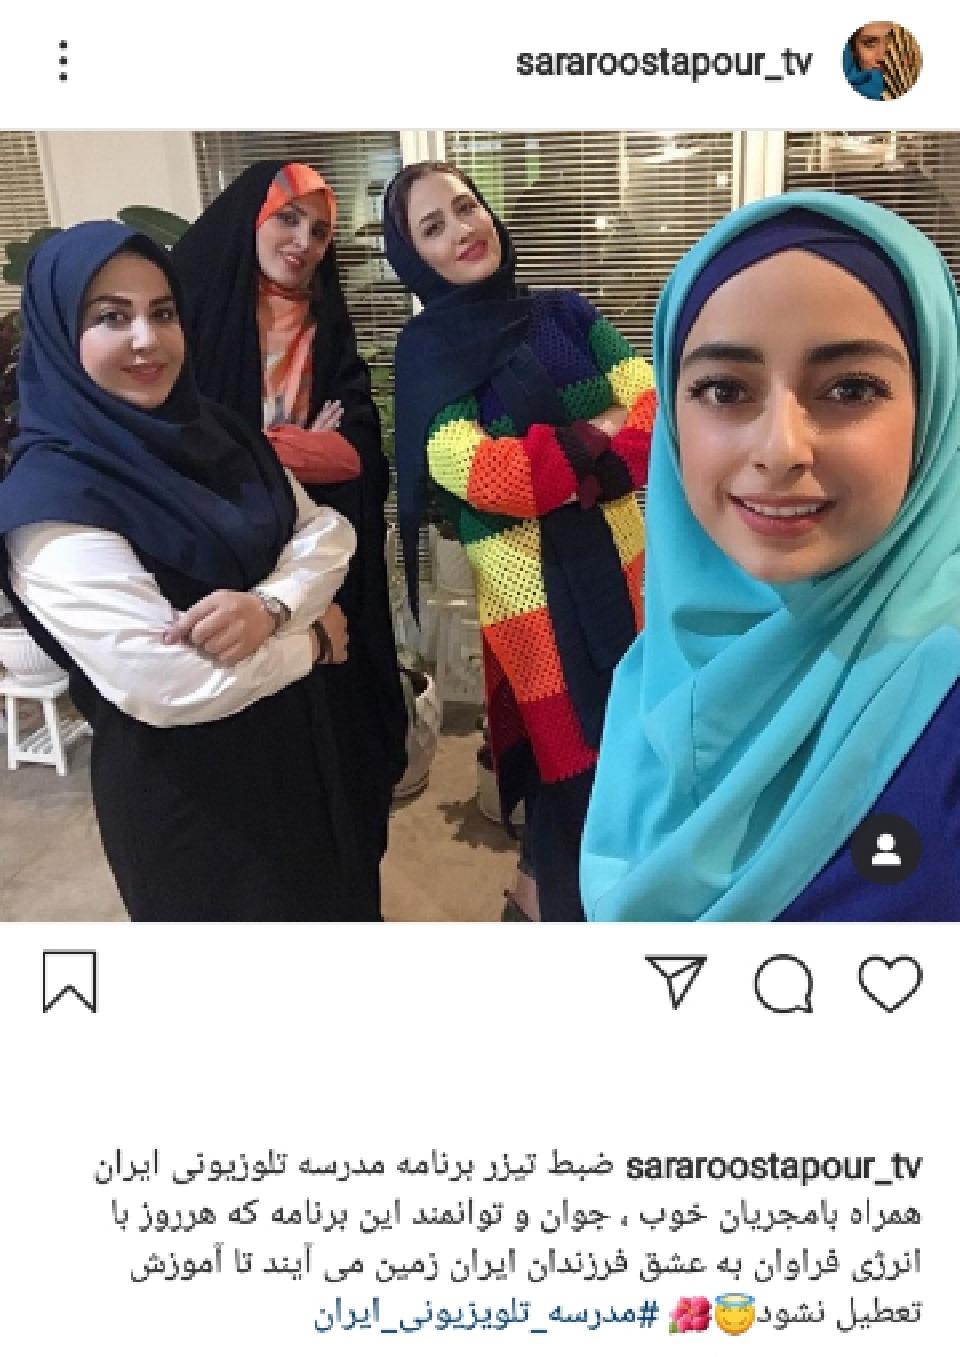 پشت صحنه مدرسه تلویزیونی ایران